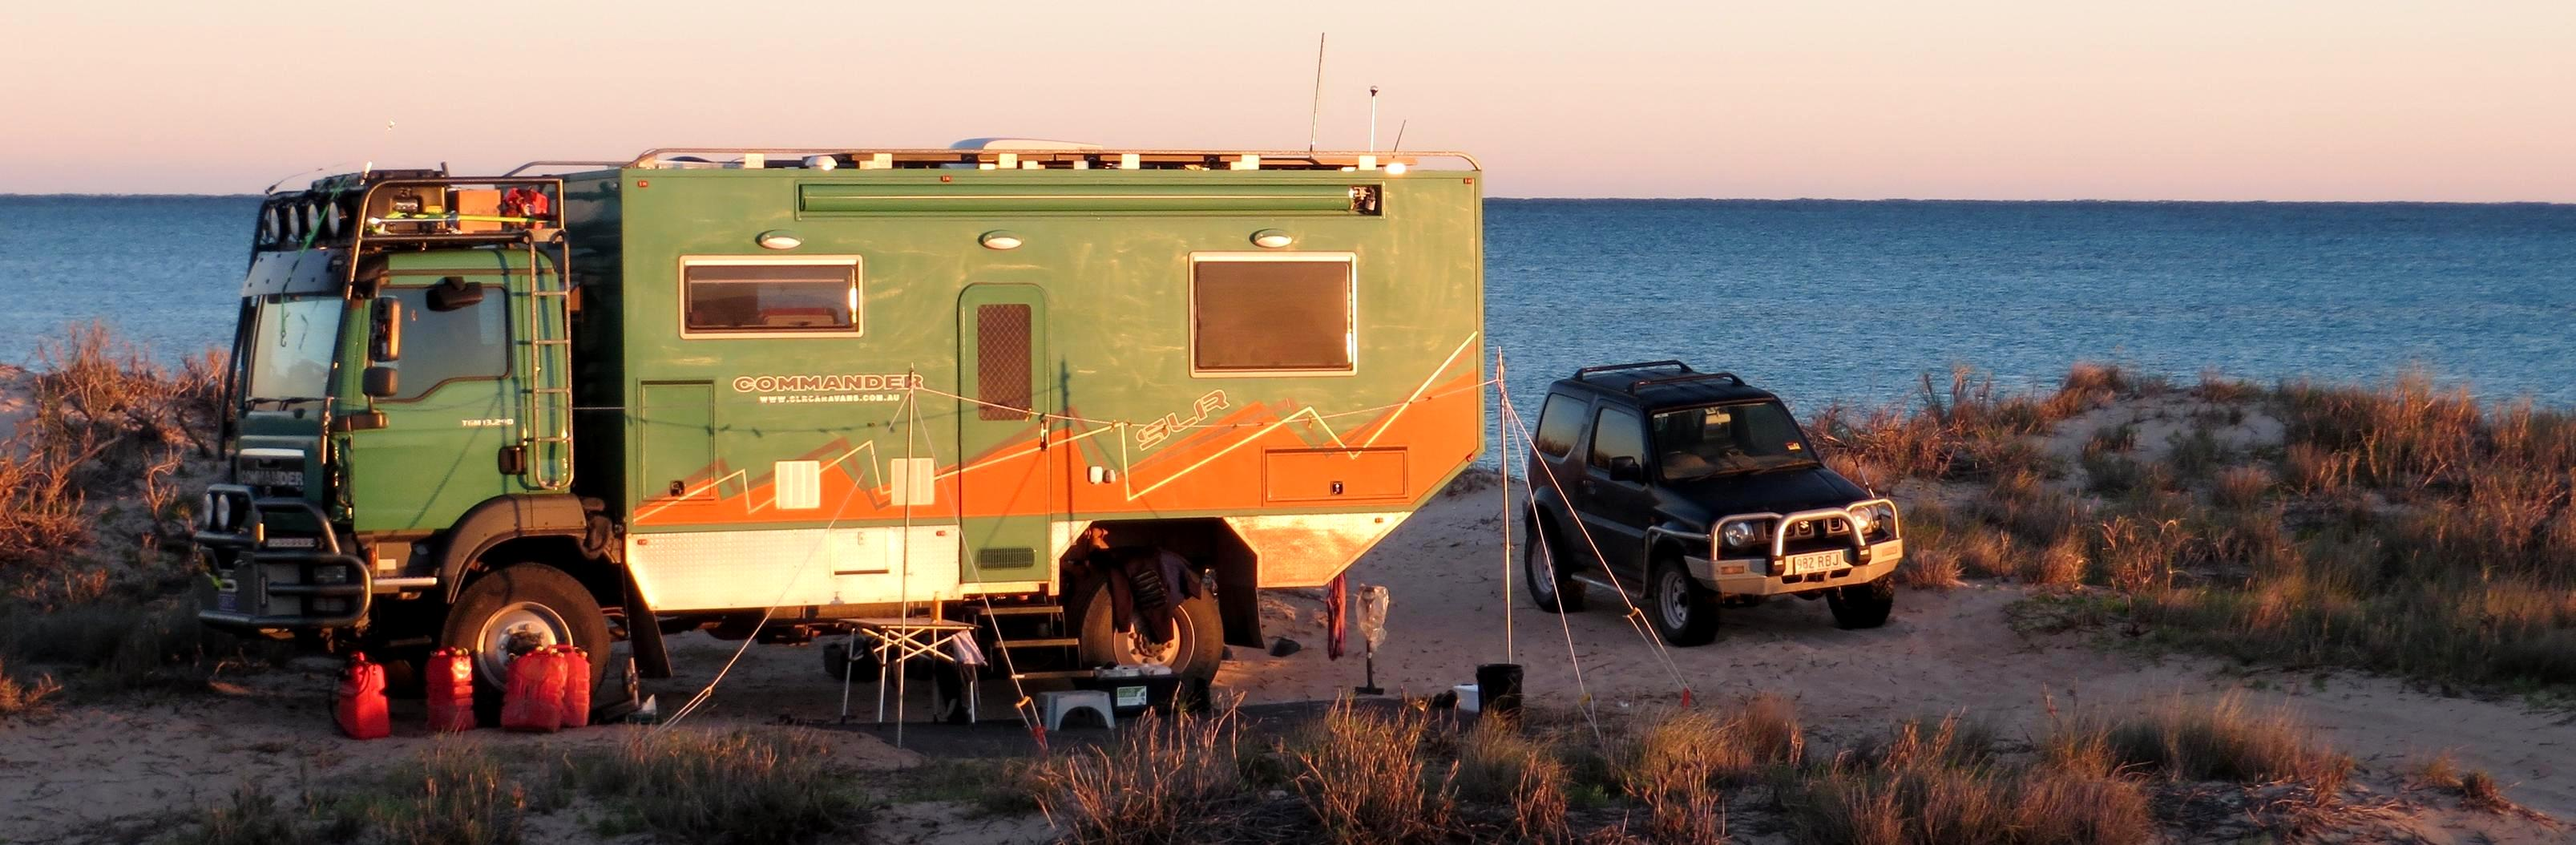 slr man commander 4x4 motorhome expedition vehicle